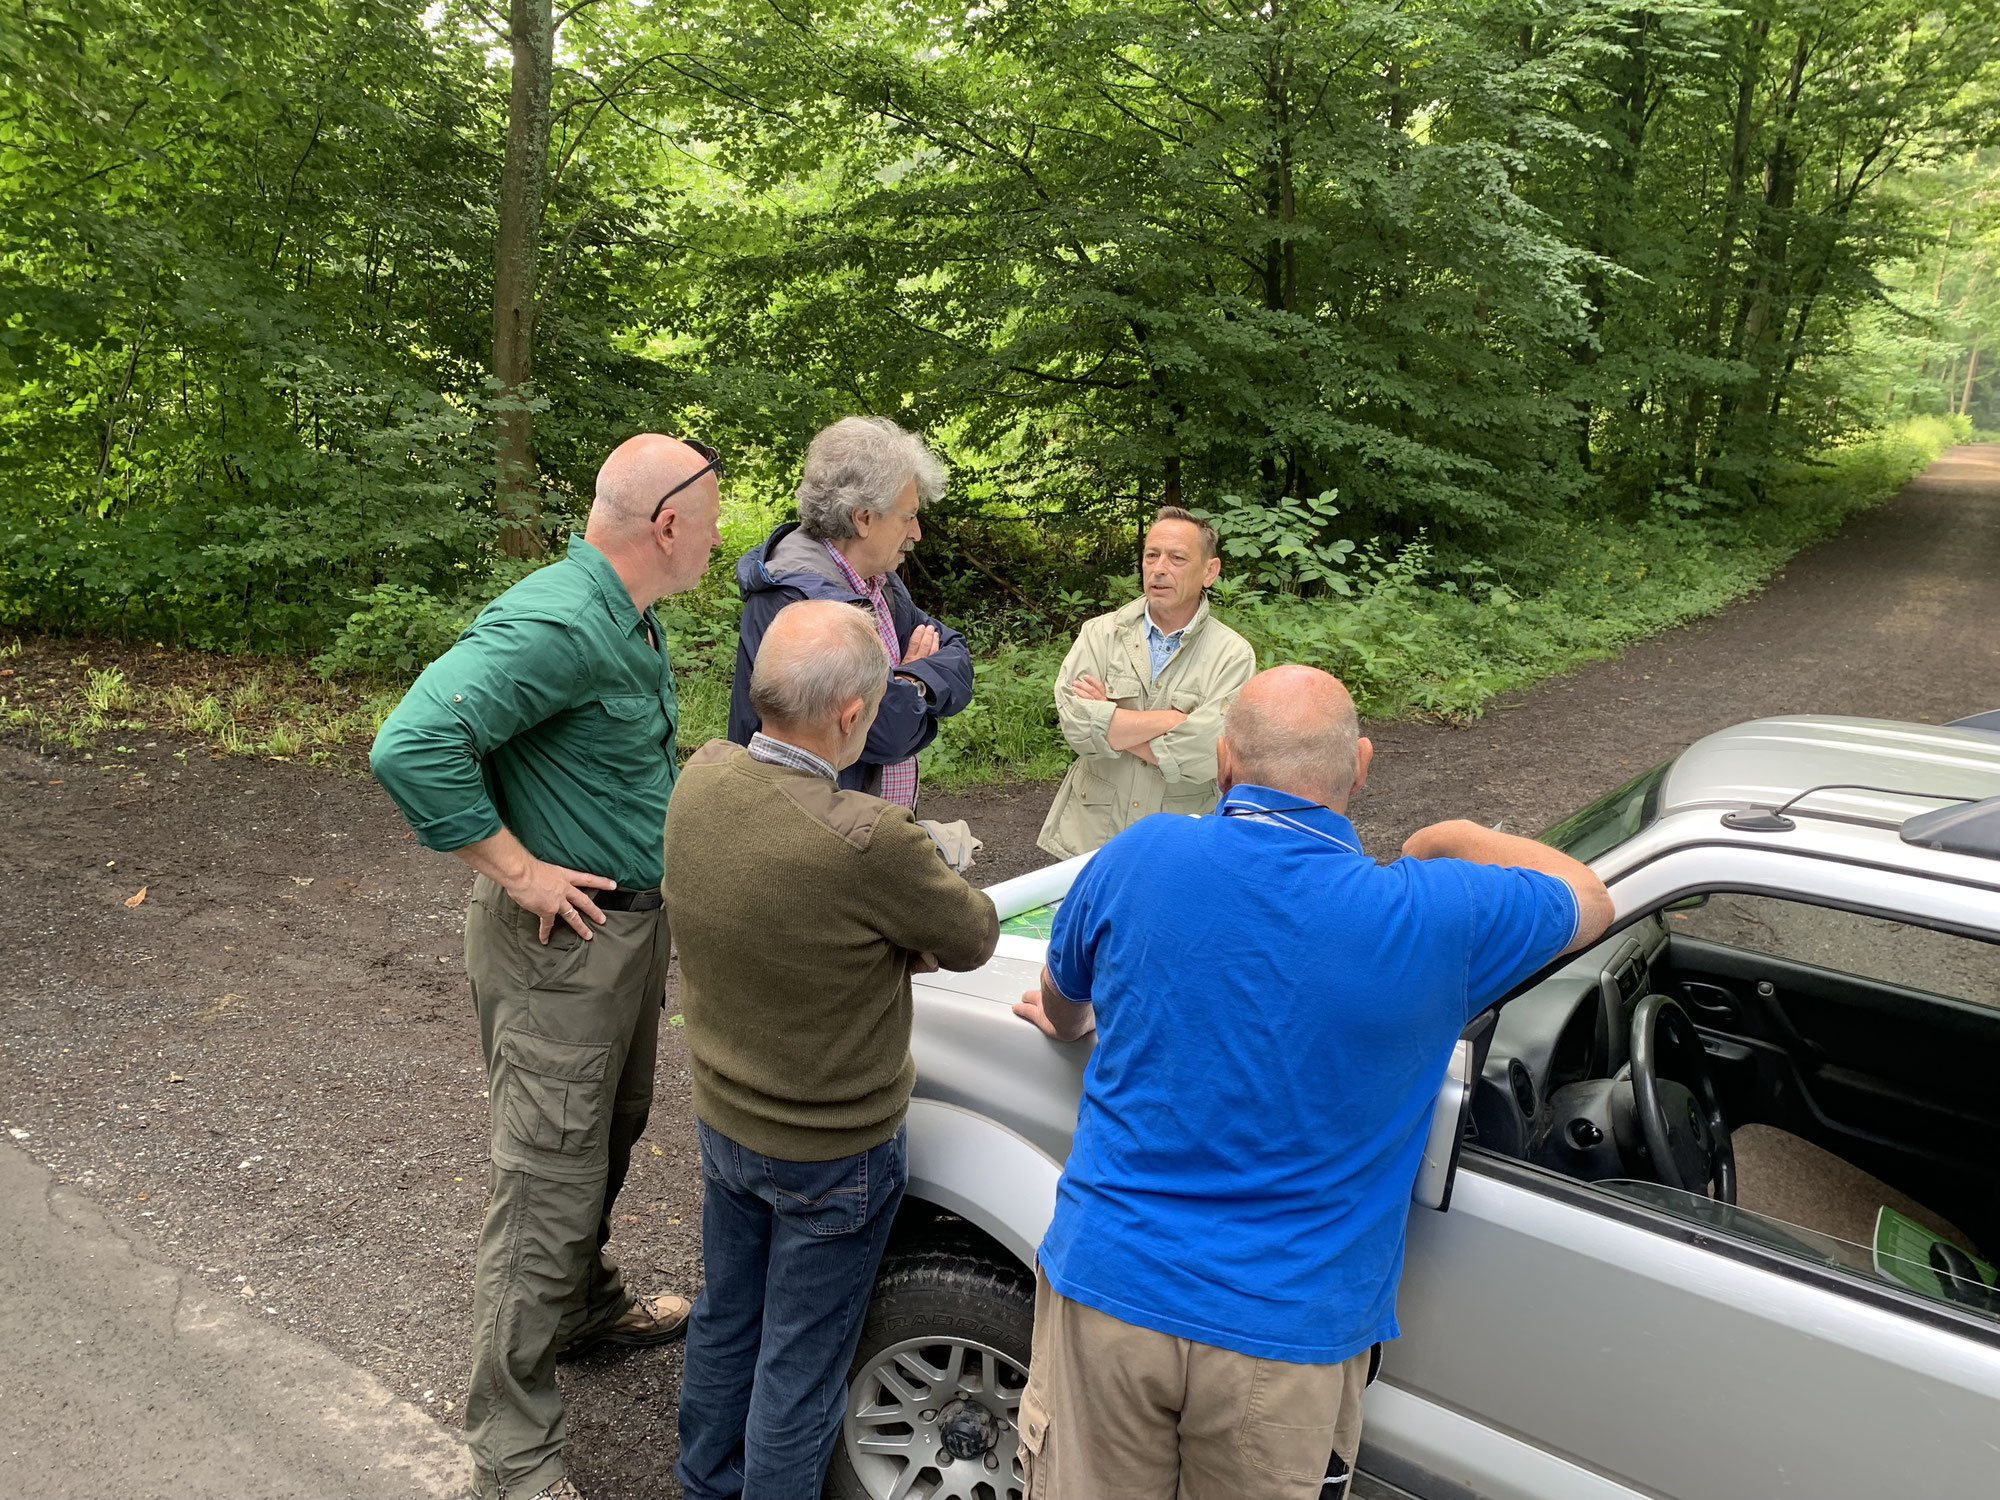 Begehung im Revier Krofdorf-Gleiberg mit Jagdpächter Dr. Rainer Hospes